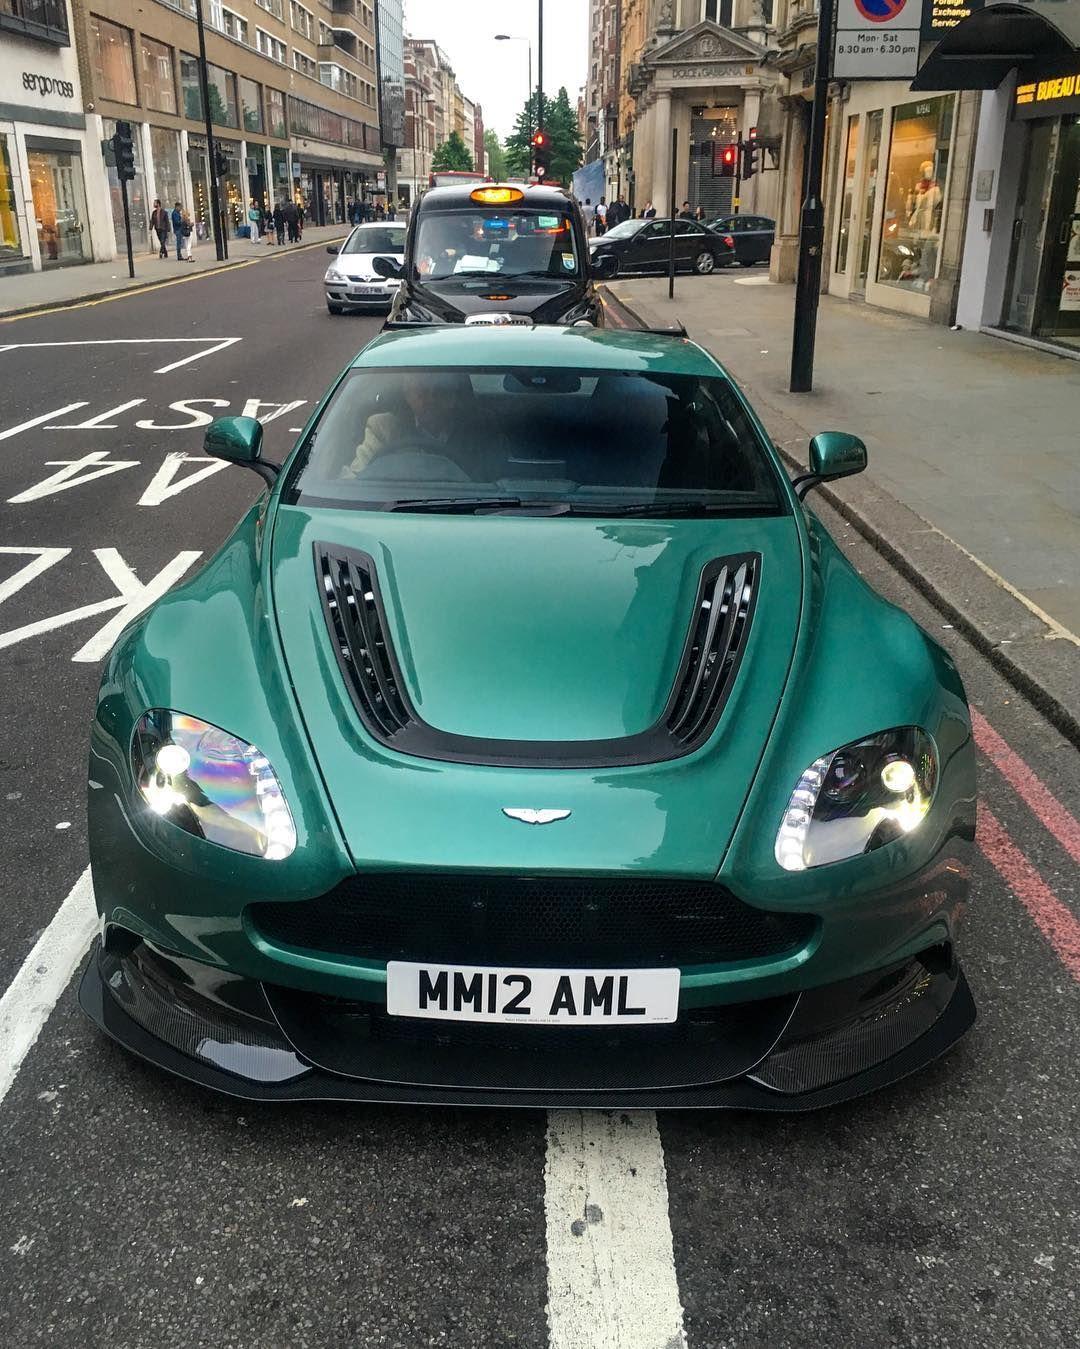 Aston Martin Race Car: Aston Martin Vantage GT12